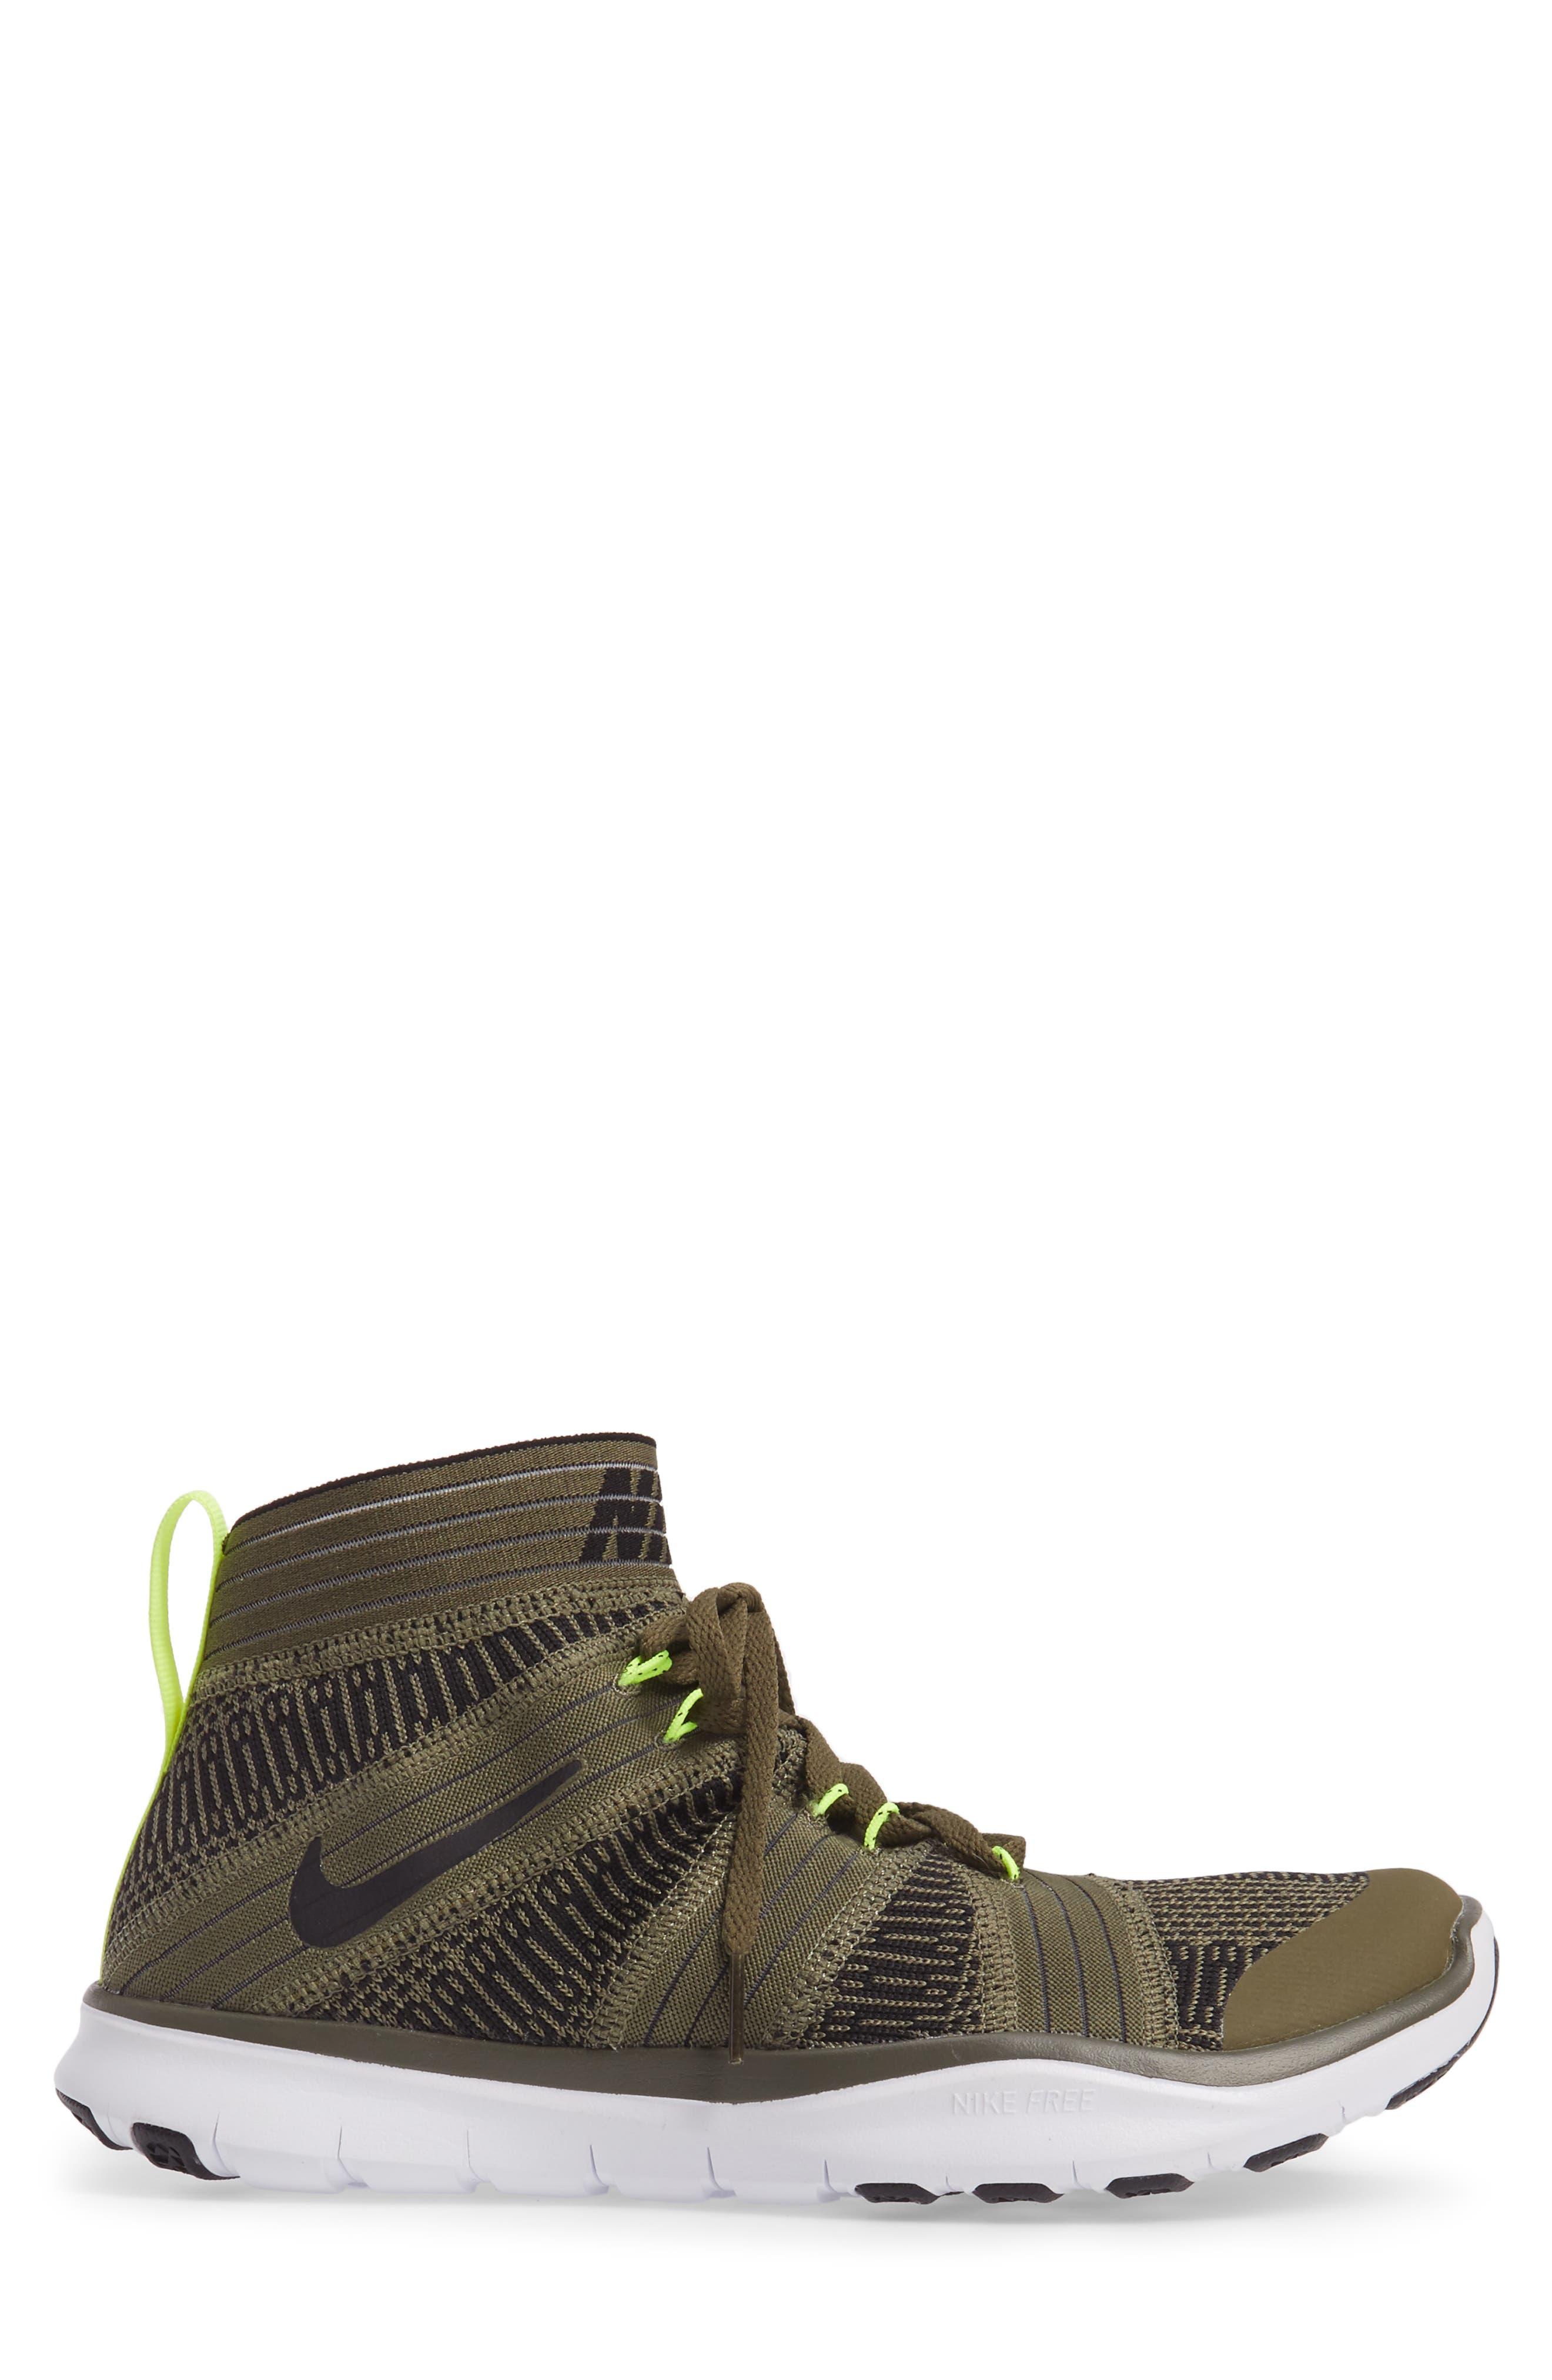 Alternate Image 3  - Nike Free Train Virtue Training Shoe (Men)